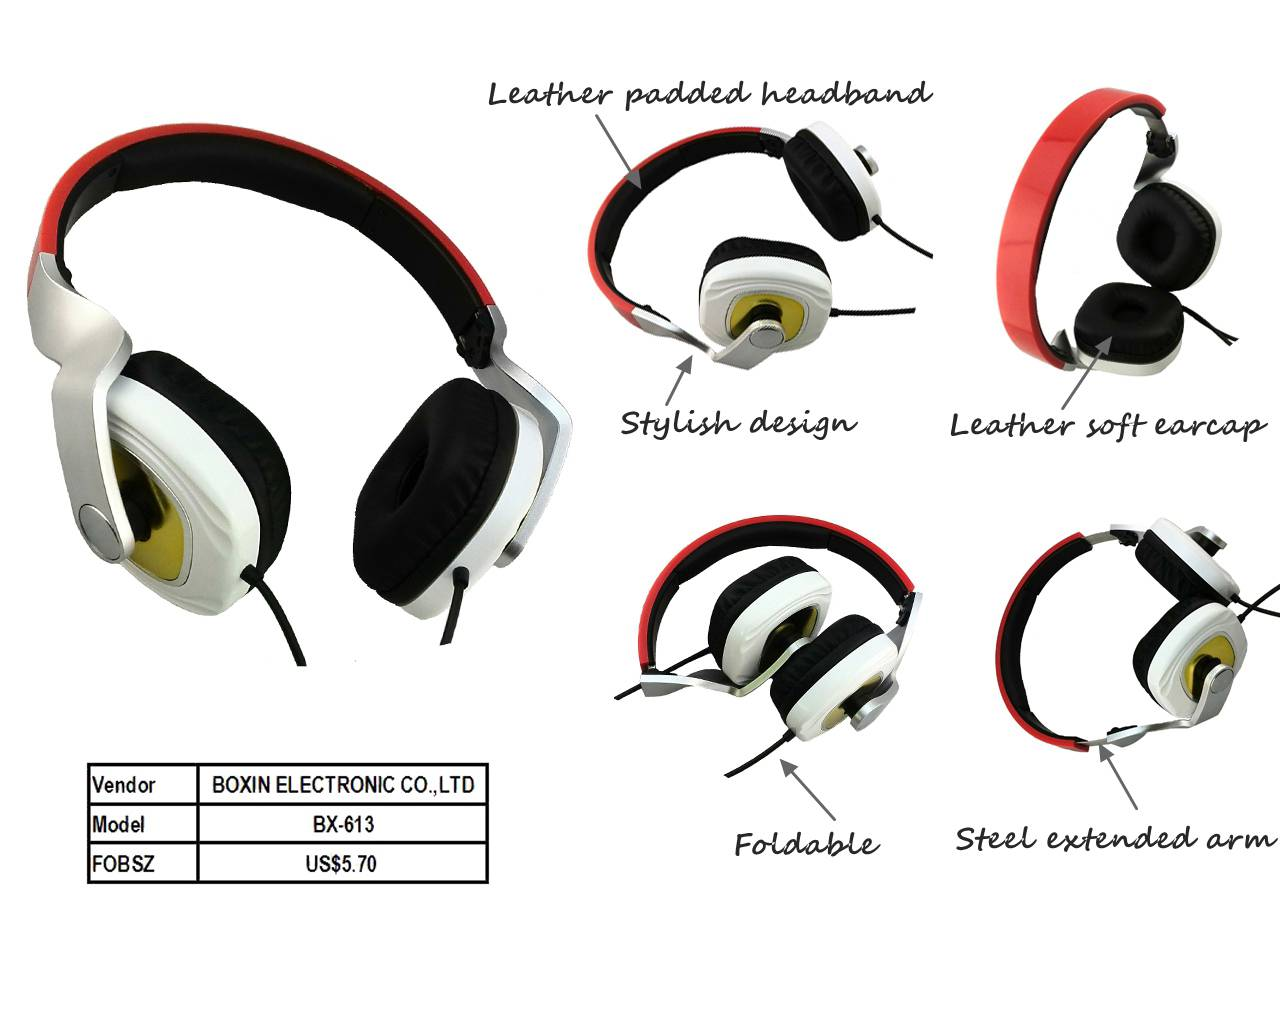 Stereo headphone new foldable Media Microphone